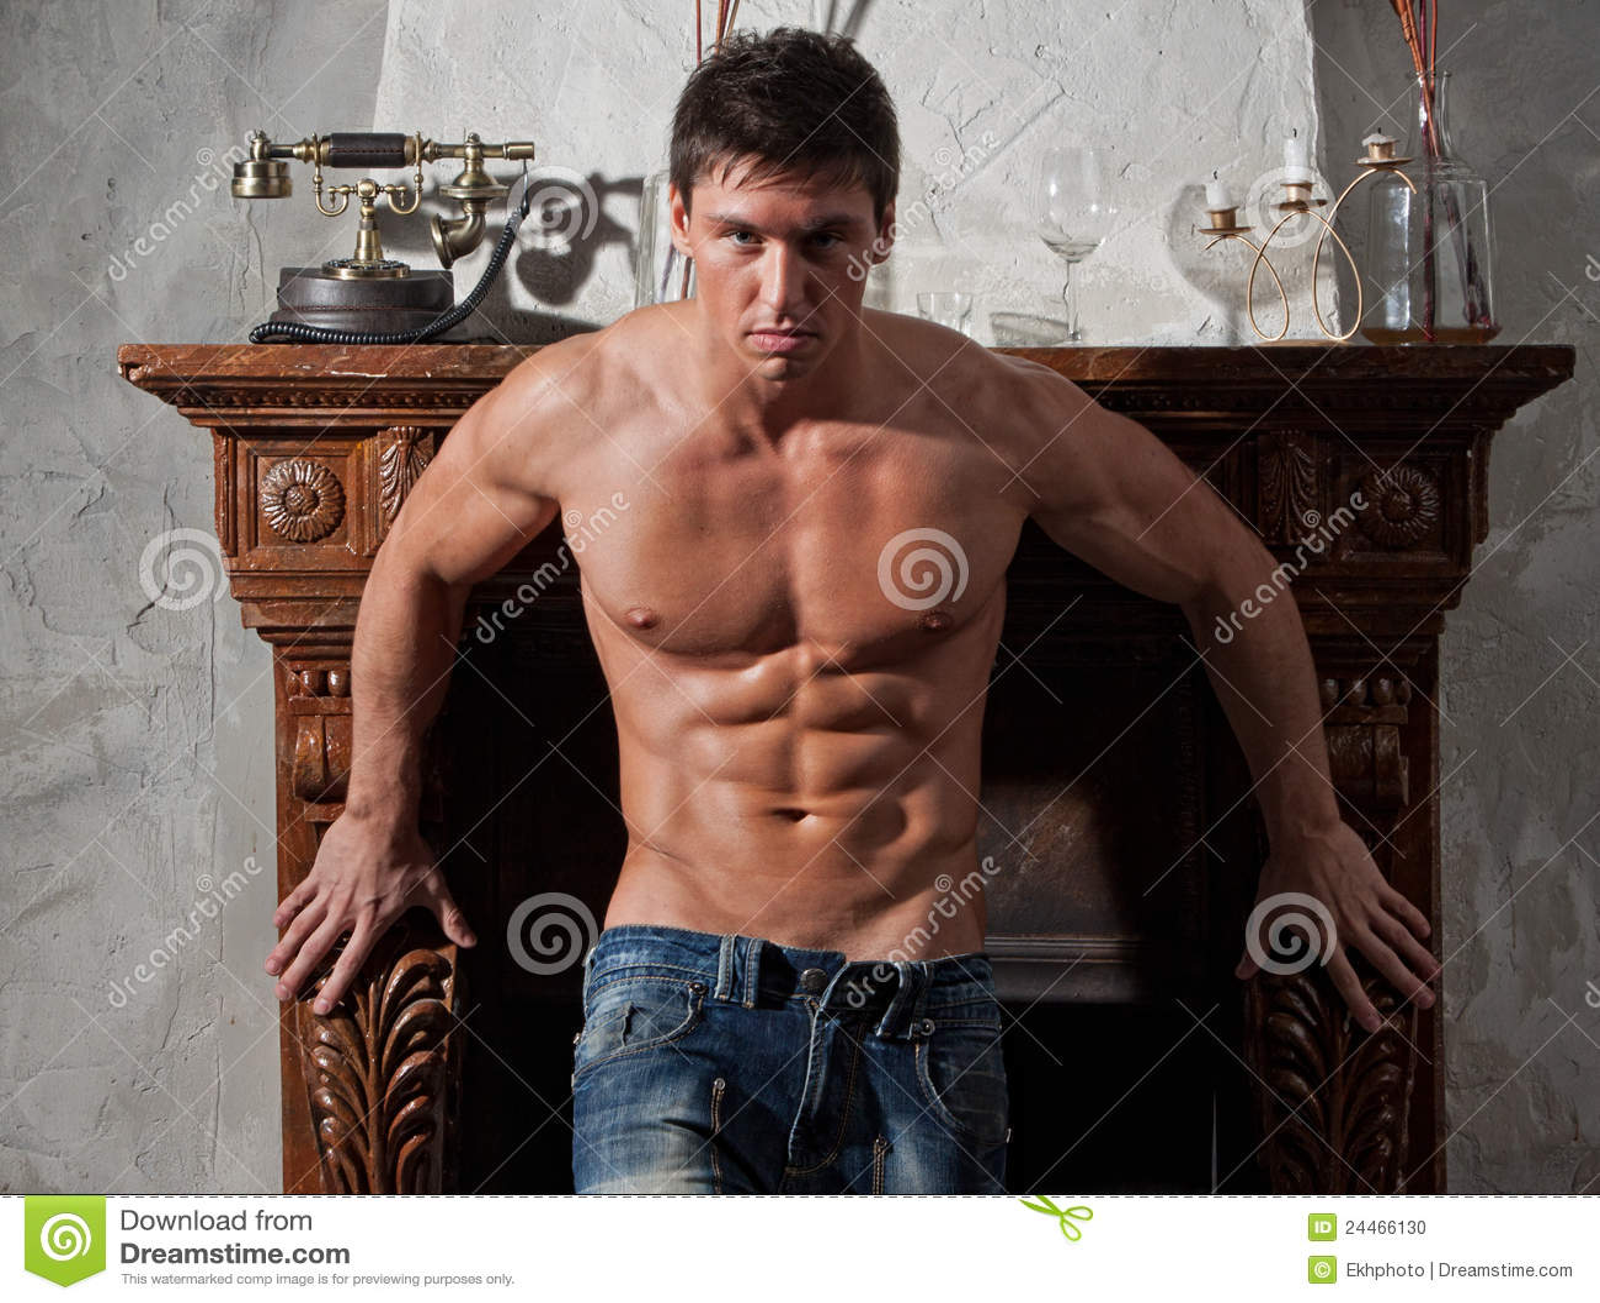 Immagine uomo nudo gay gratis